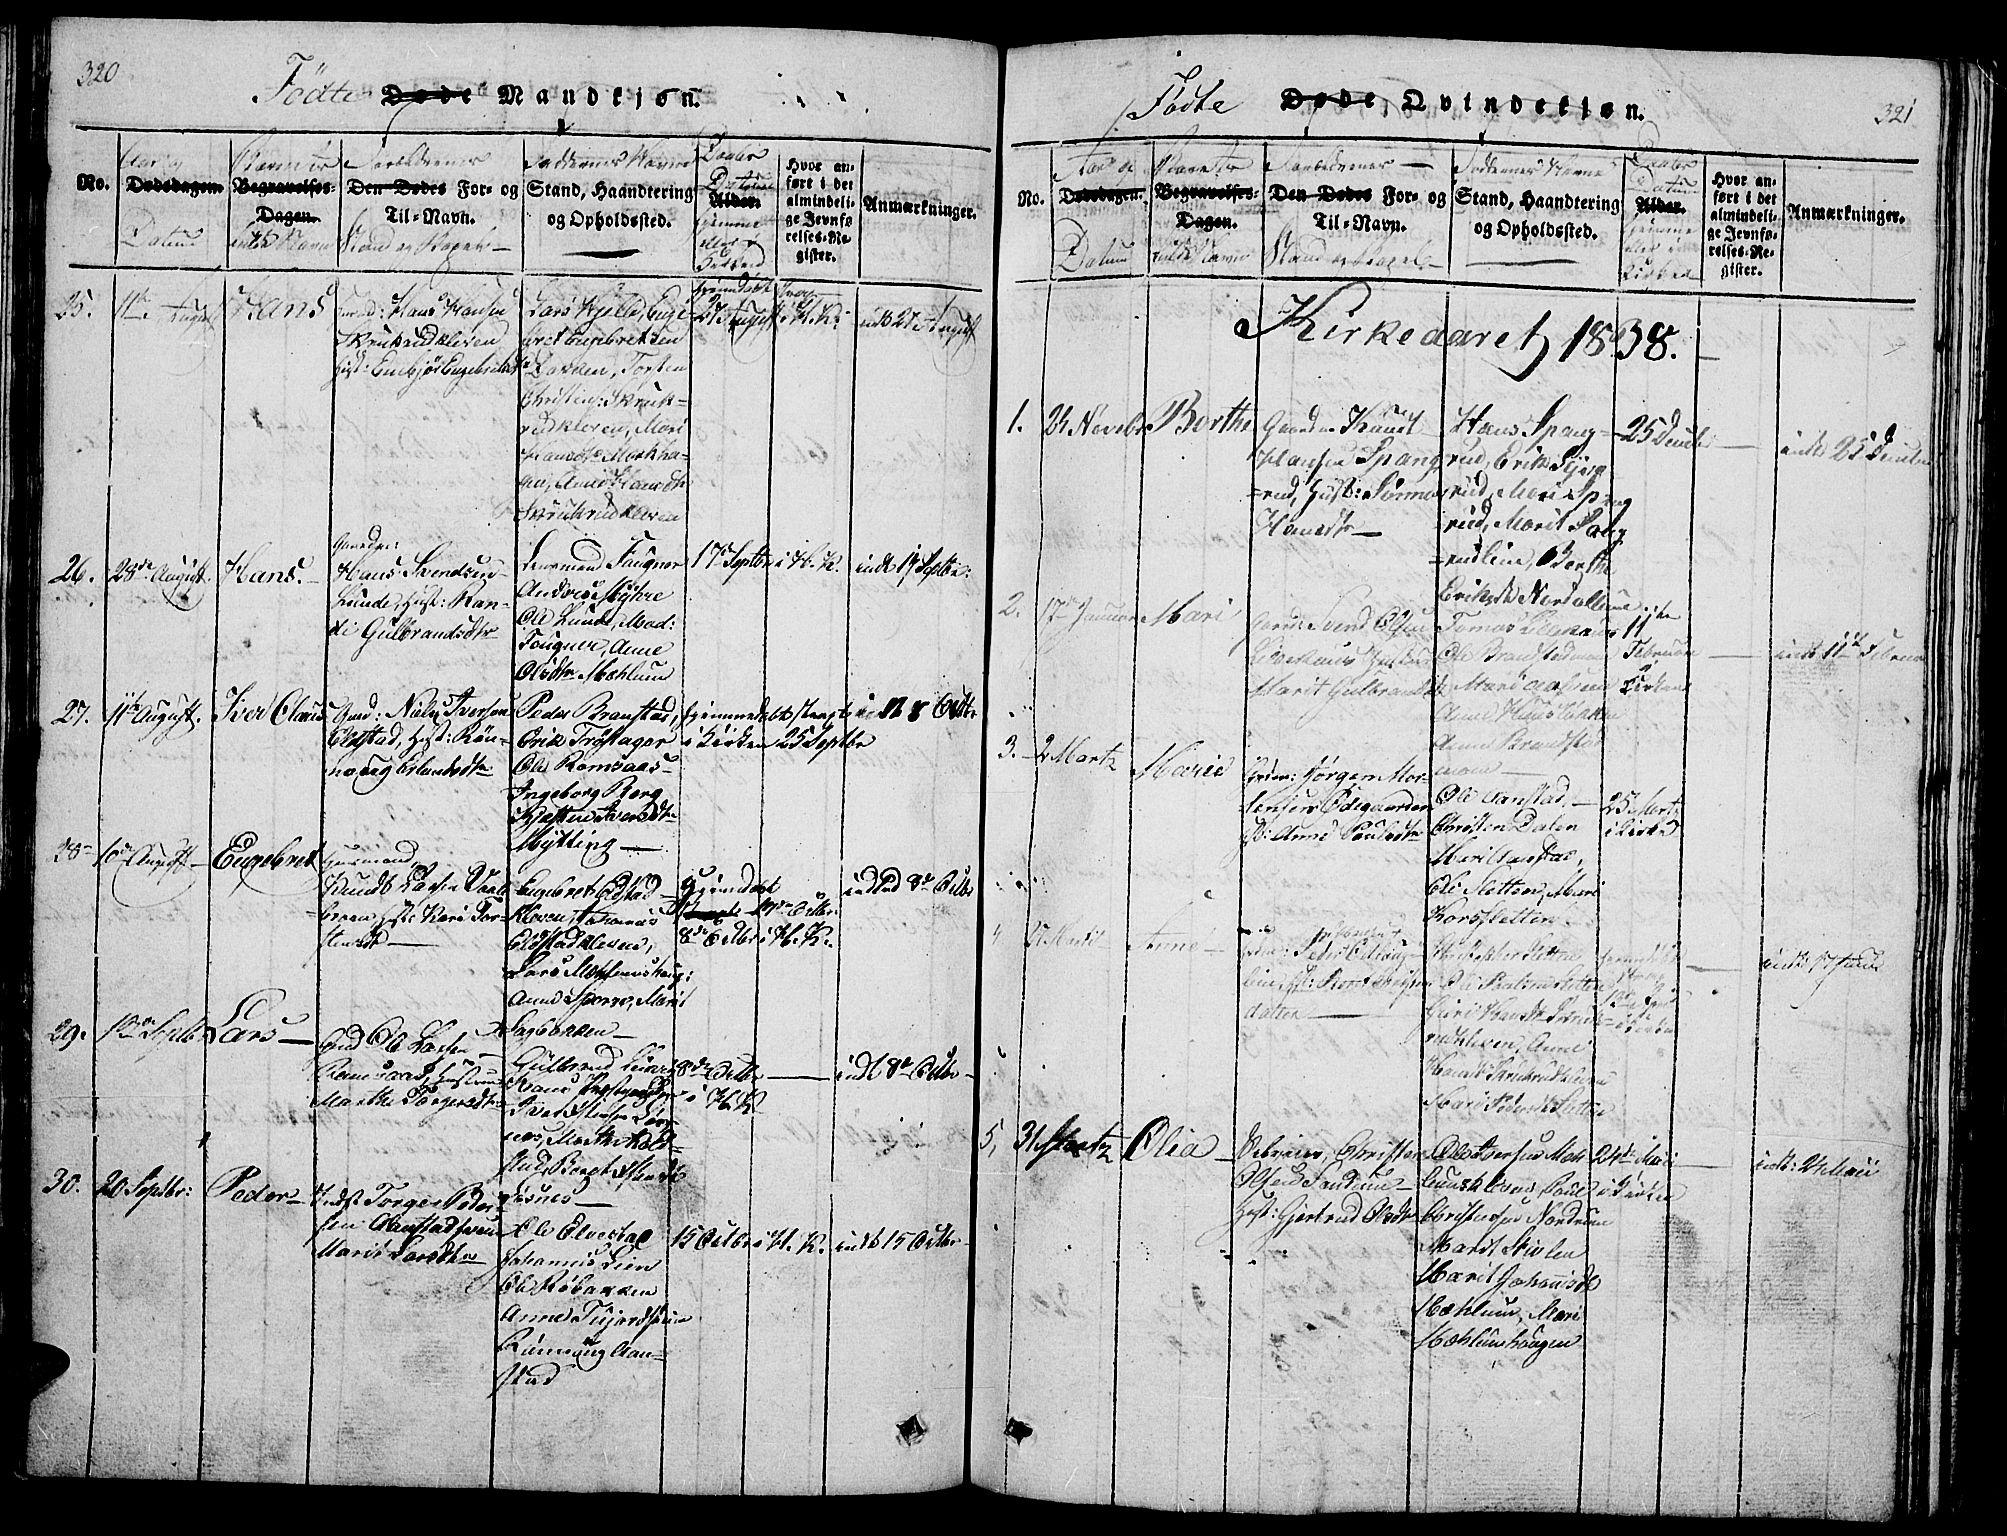 SAH, Ringebu prestekontor, Klokkerbok nr. 1, 1821-1839, s. 320-321